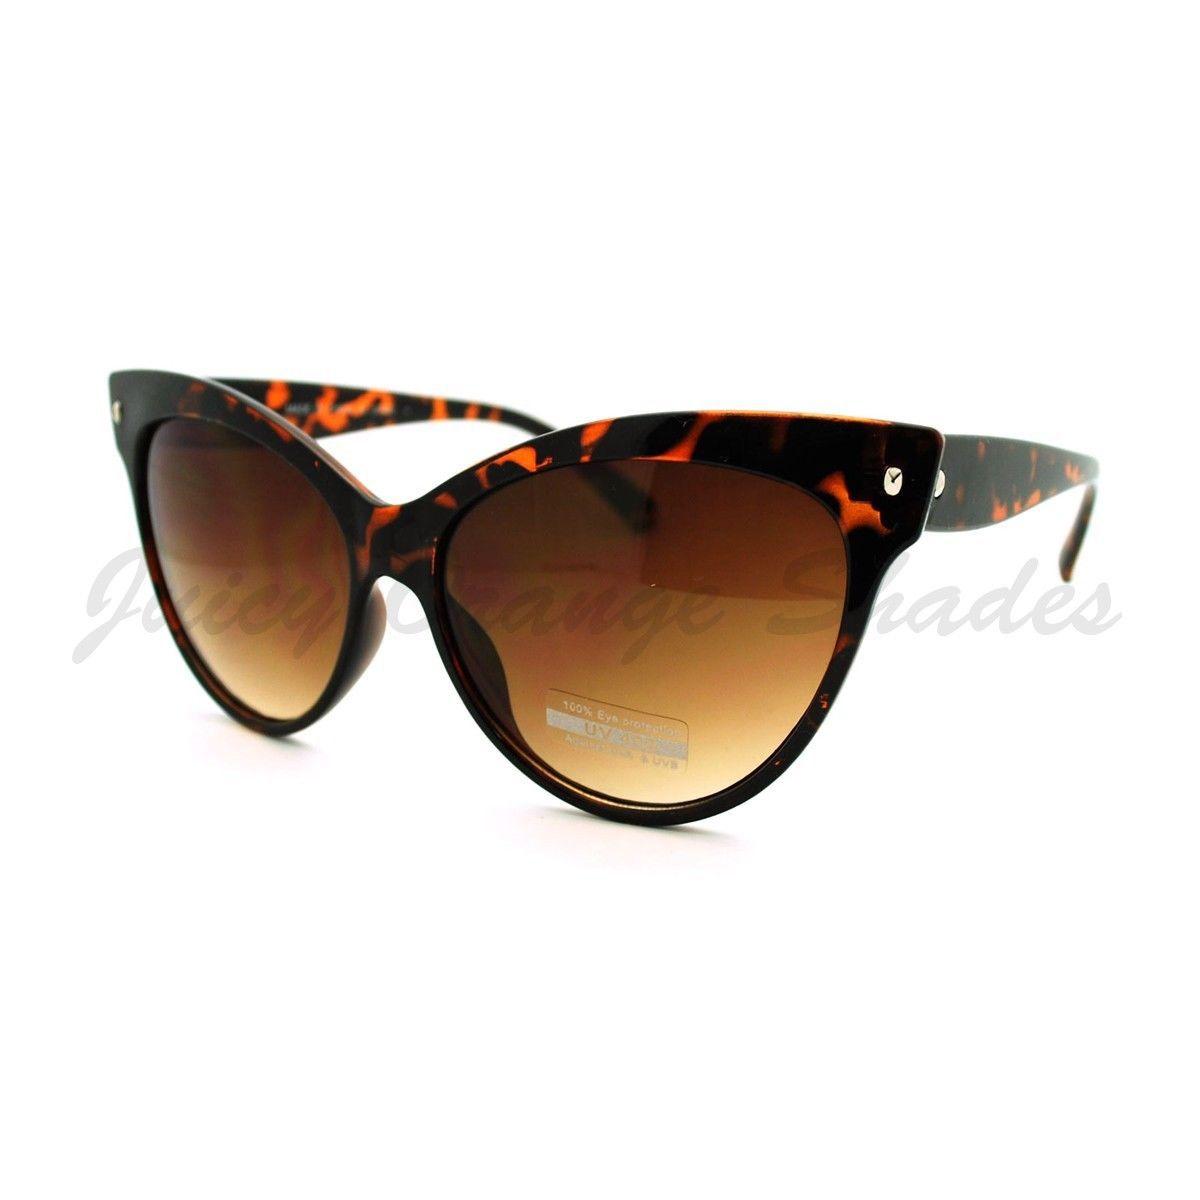 Super Cateye Sunglasses 50's 60's Fashion Iconic Shades